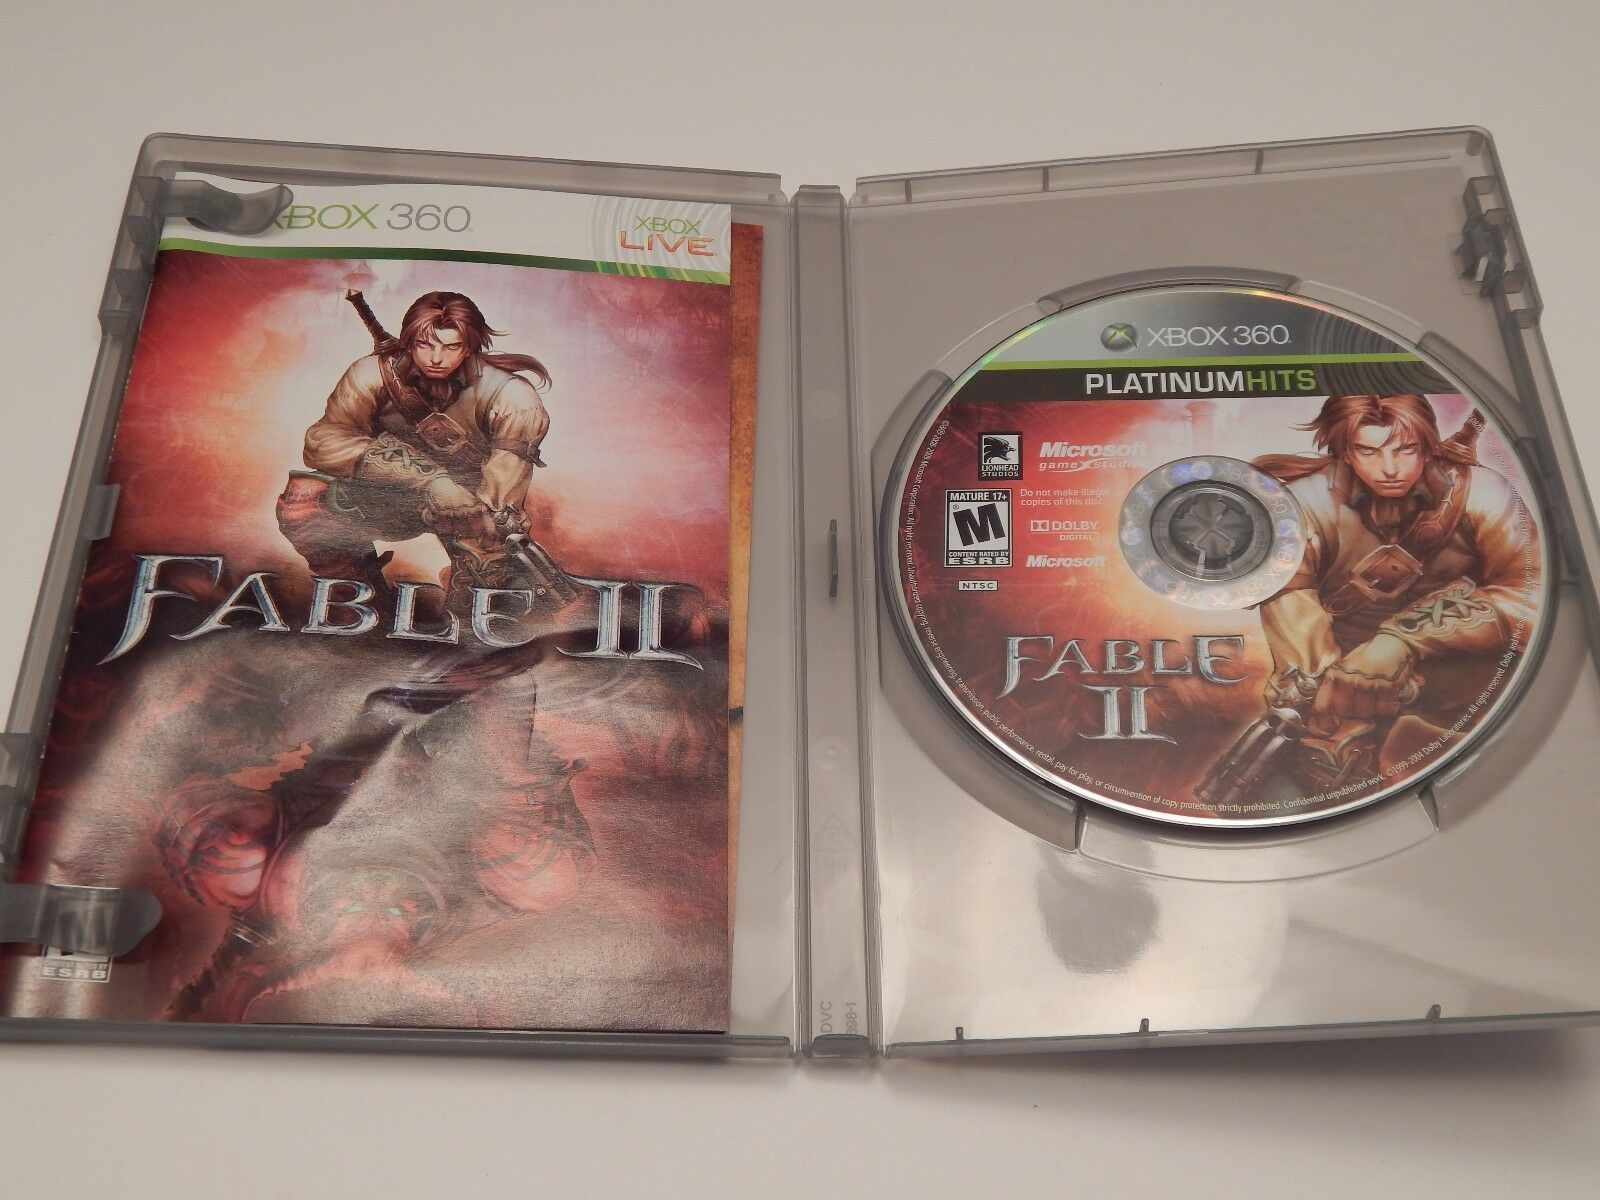 Fable II -- Platinum Hits (Microsoft Xbox 360, 2009) image 3